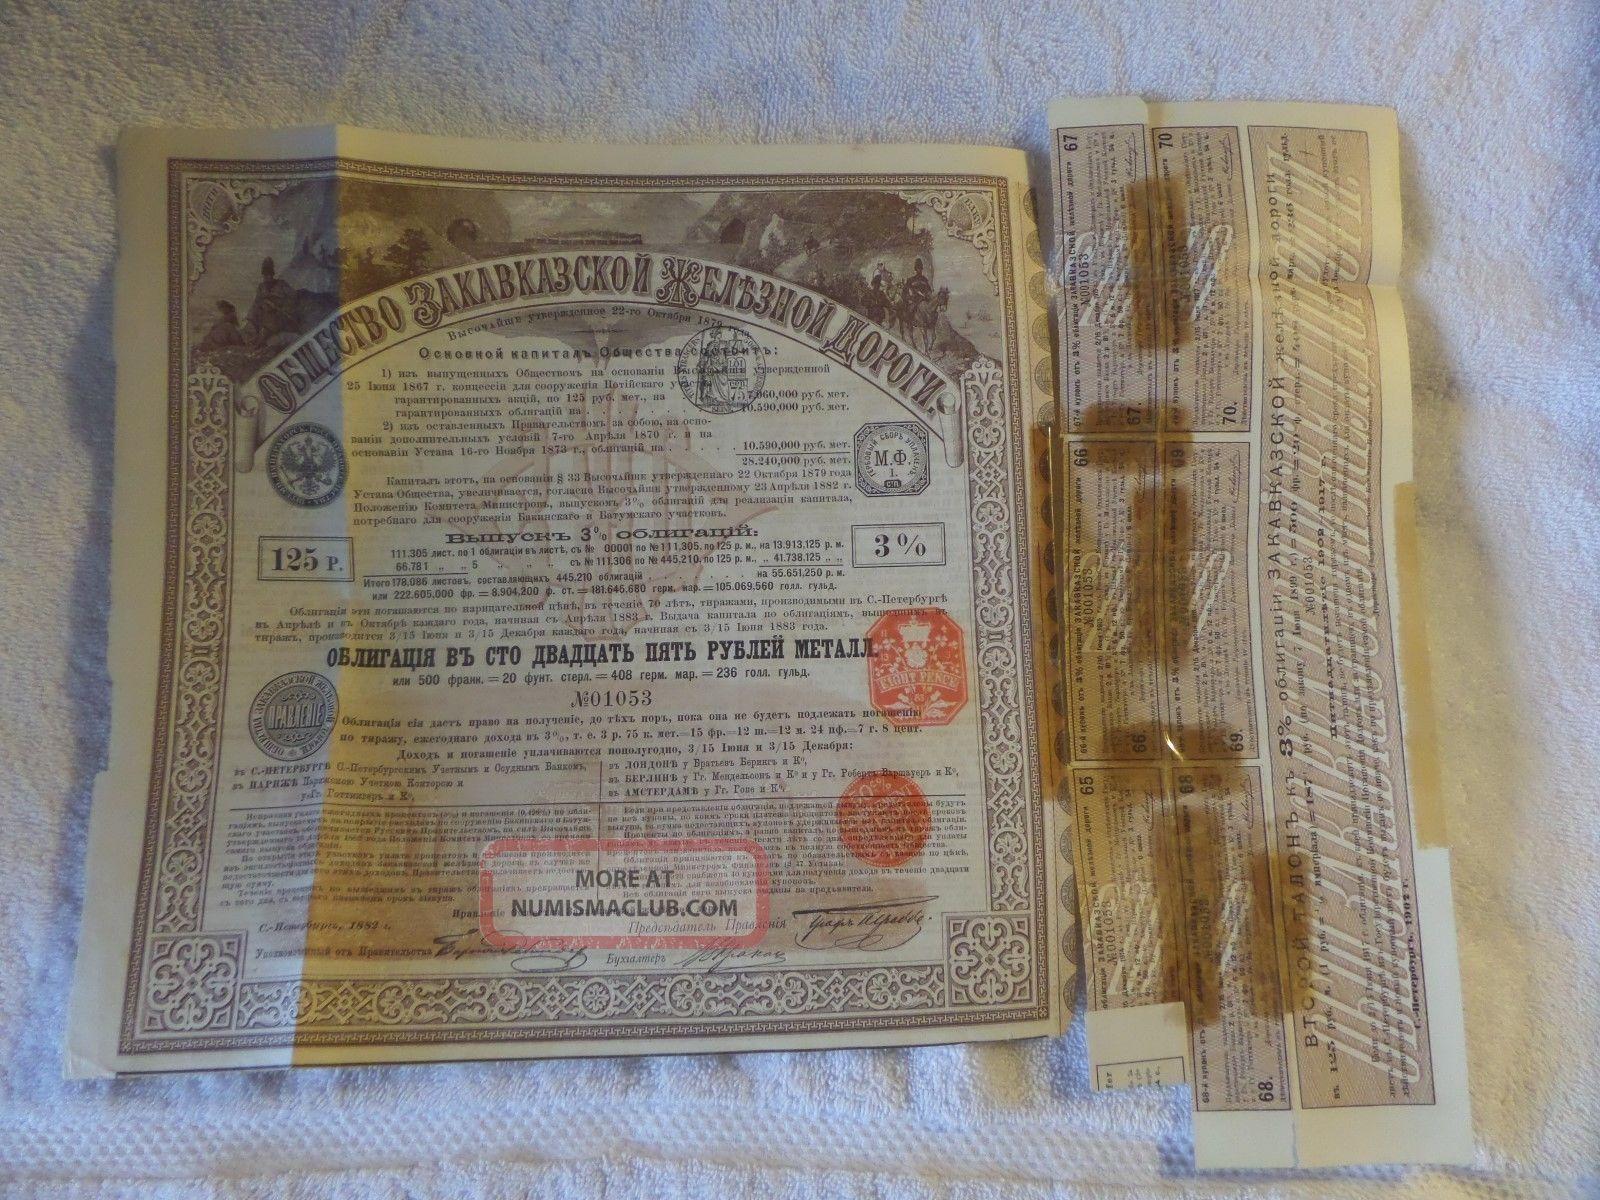 Stock Certificate Transcaucasian Railway Caucasus 1882 World photo